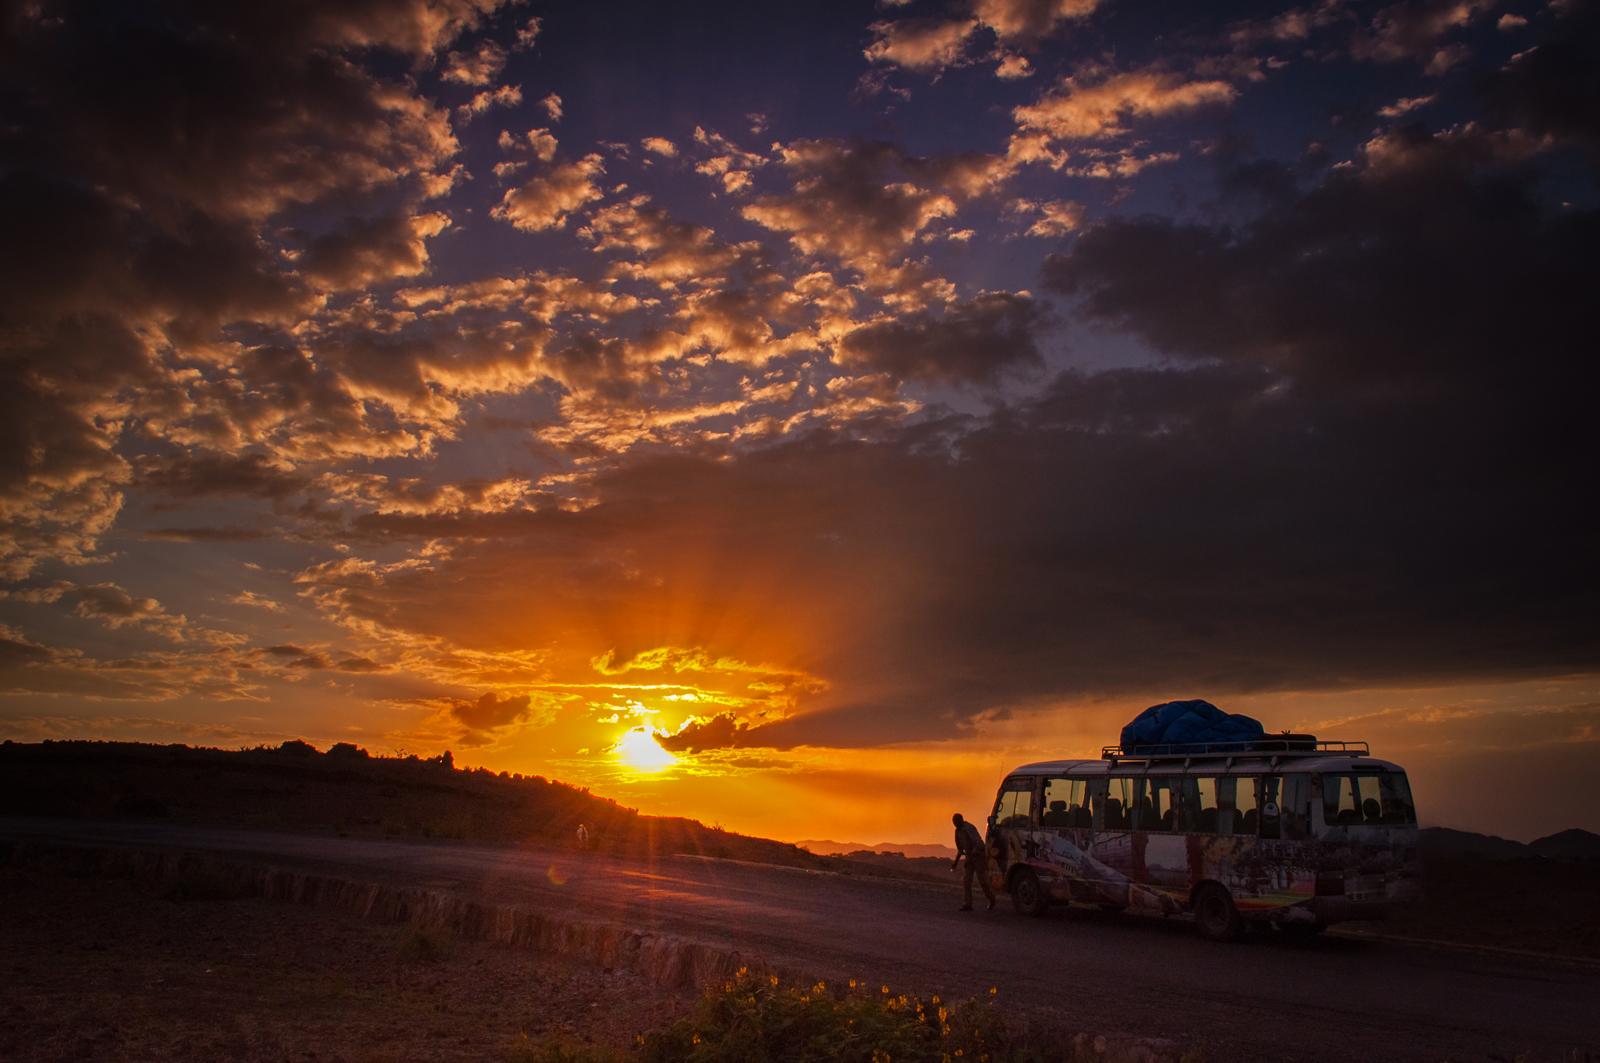 On the road to Lalibela ©Luca Zanon